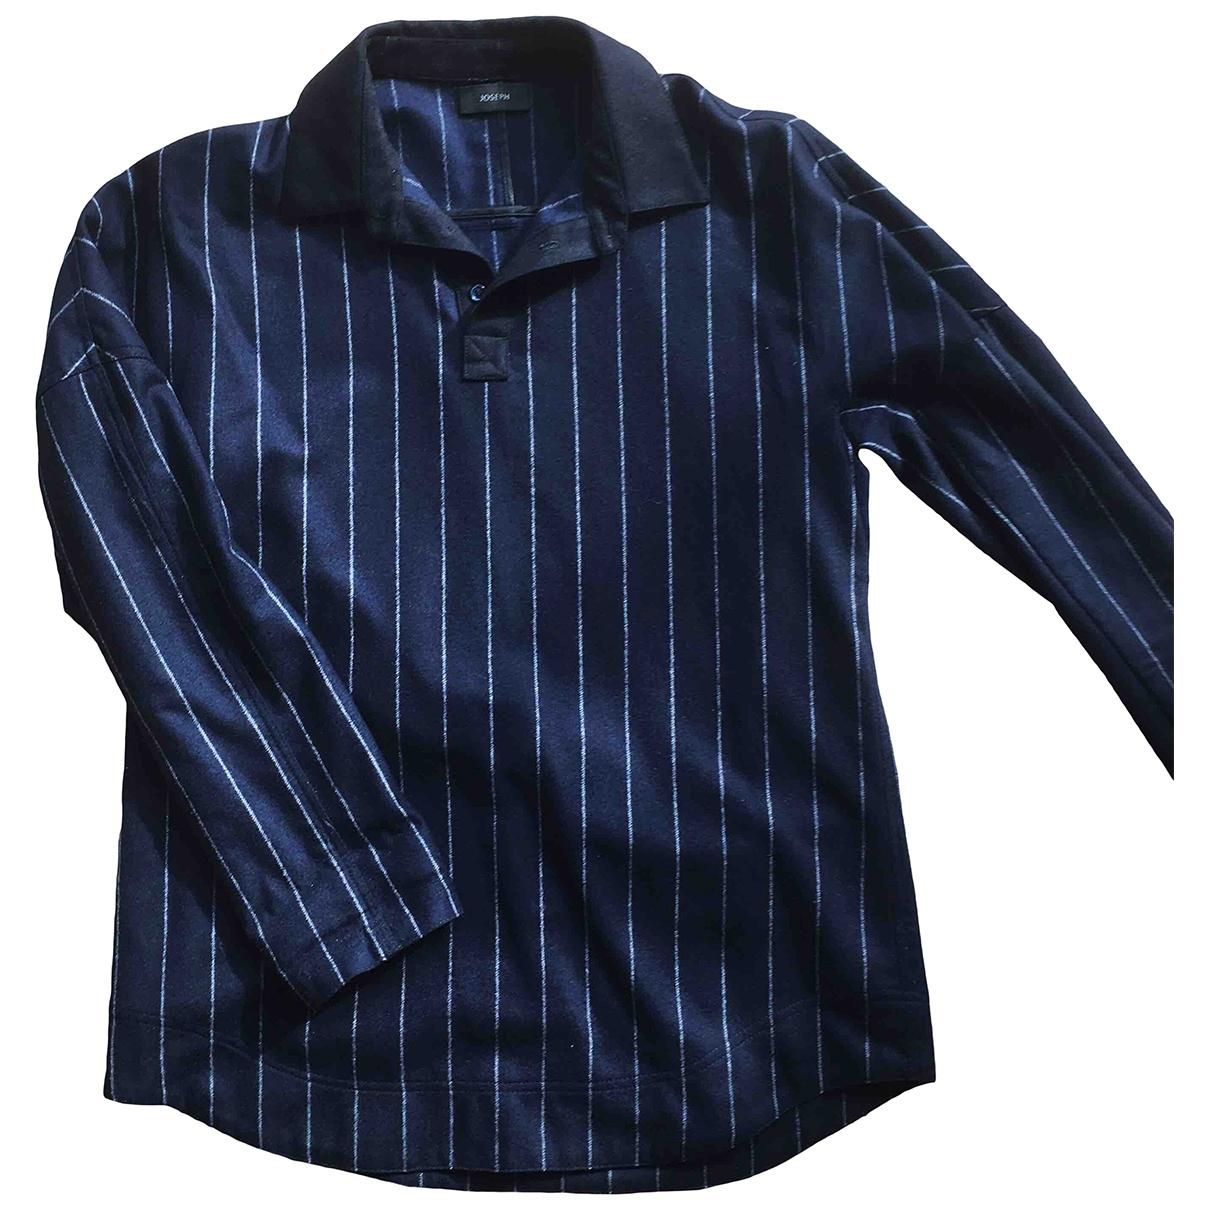 Camisas de Lana Joseph